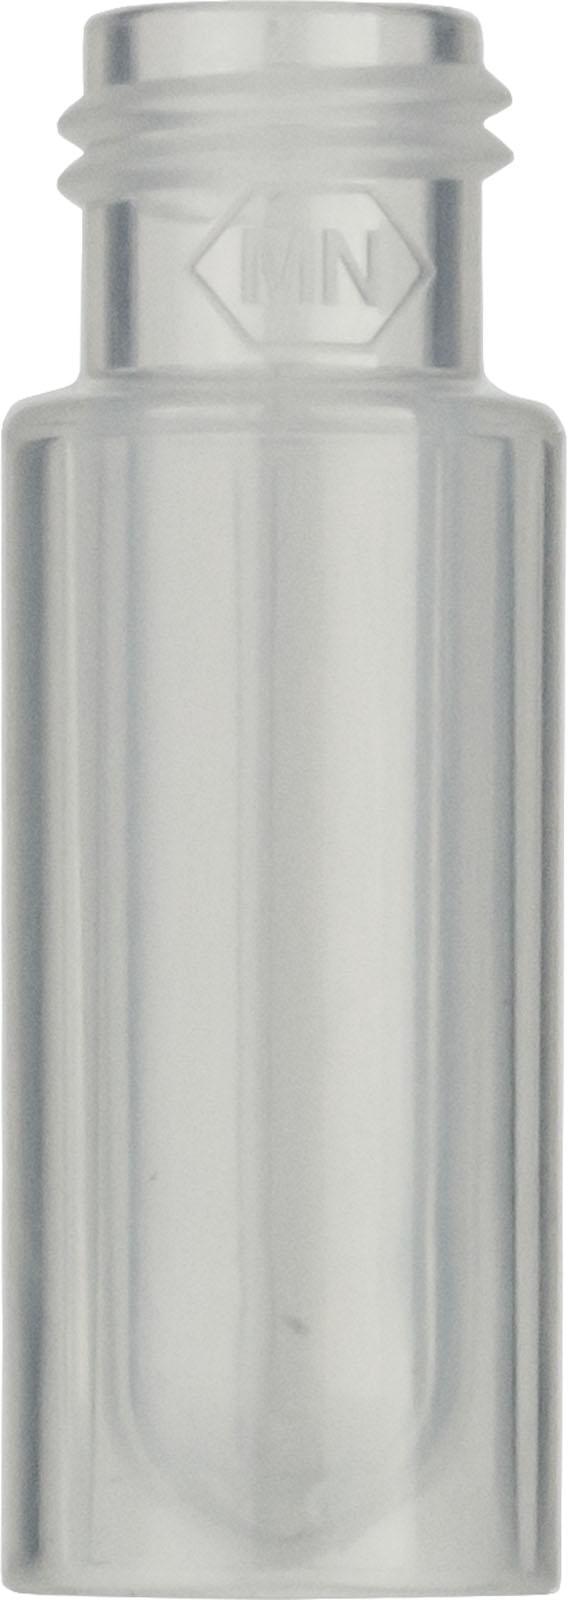 PP Vial N9-0.7, GW, tr, 11,6x32, zyl.